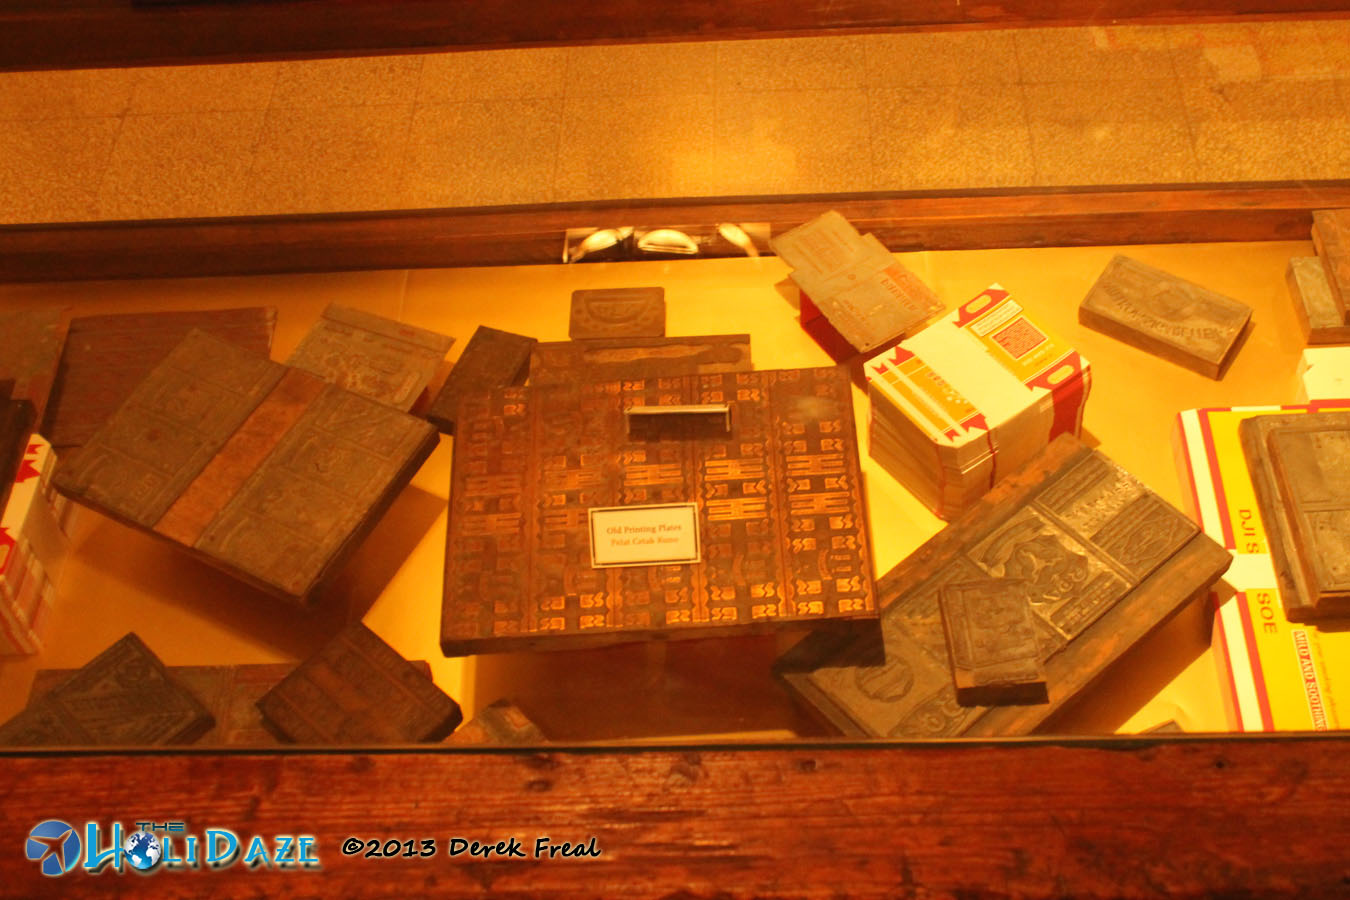 Old House Of Sampoerna Printing Plates